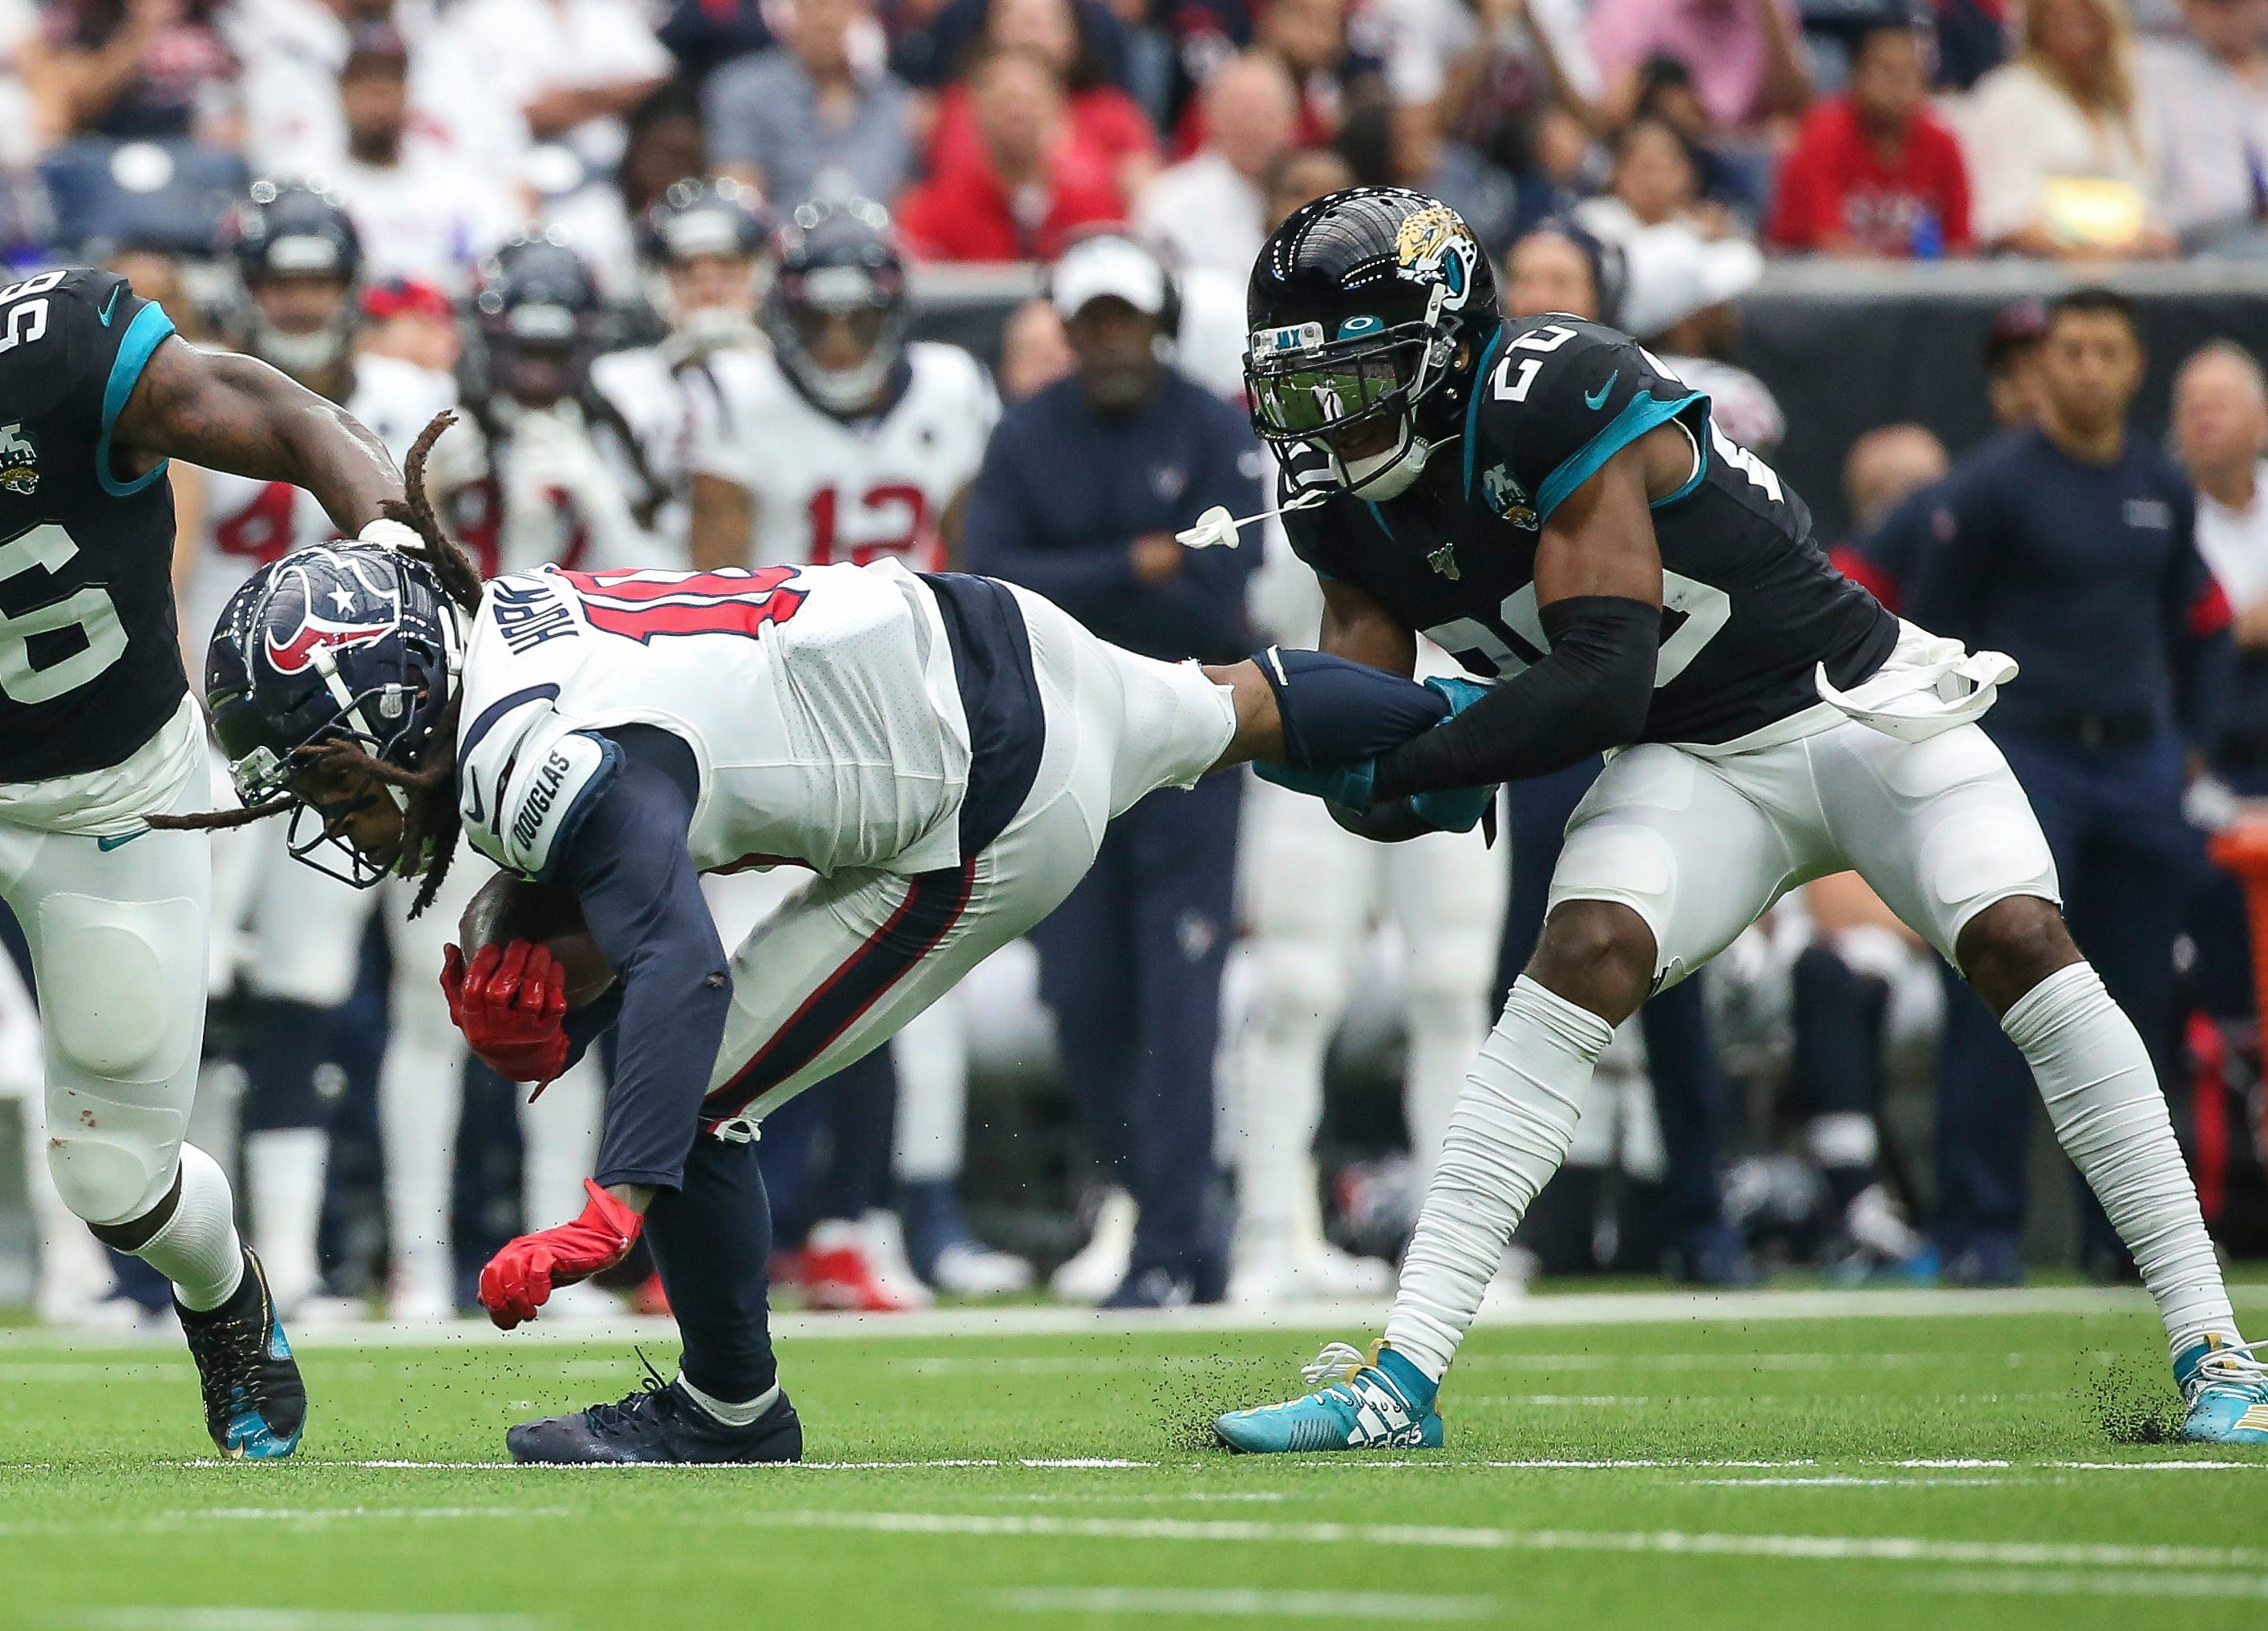 Rivalry renewed: Get popcorn ready for Cardinals' DeAndre Hopkins vs. Rams' Jalen Ramsey